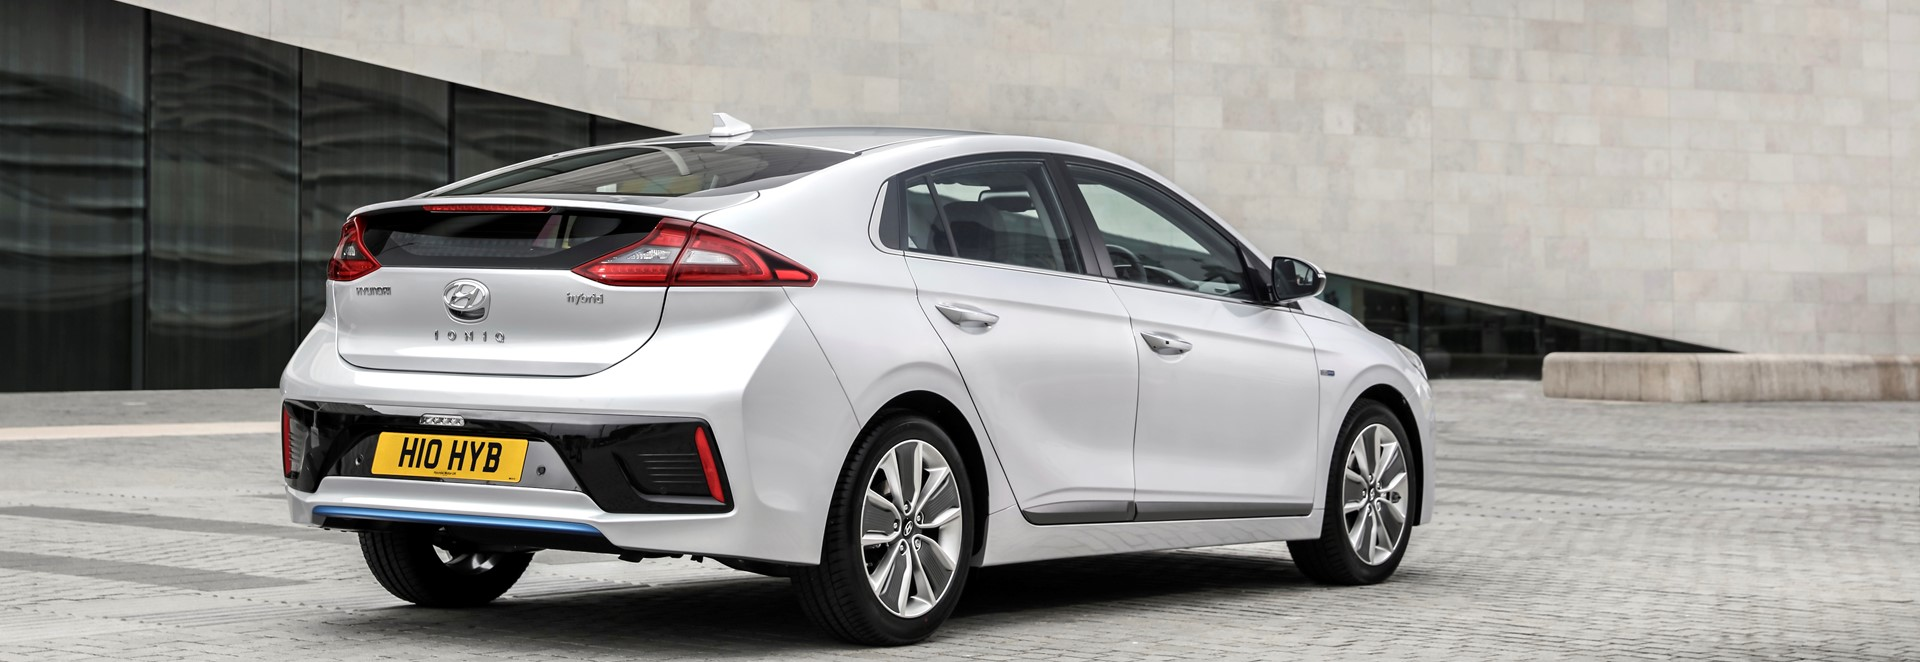 hyundai ioniq hybrid premium se hatchback review car keys. Black Bedroom Furniture Sets. Home Design Ideas